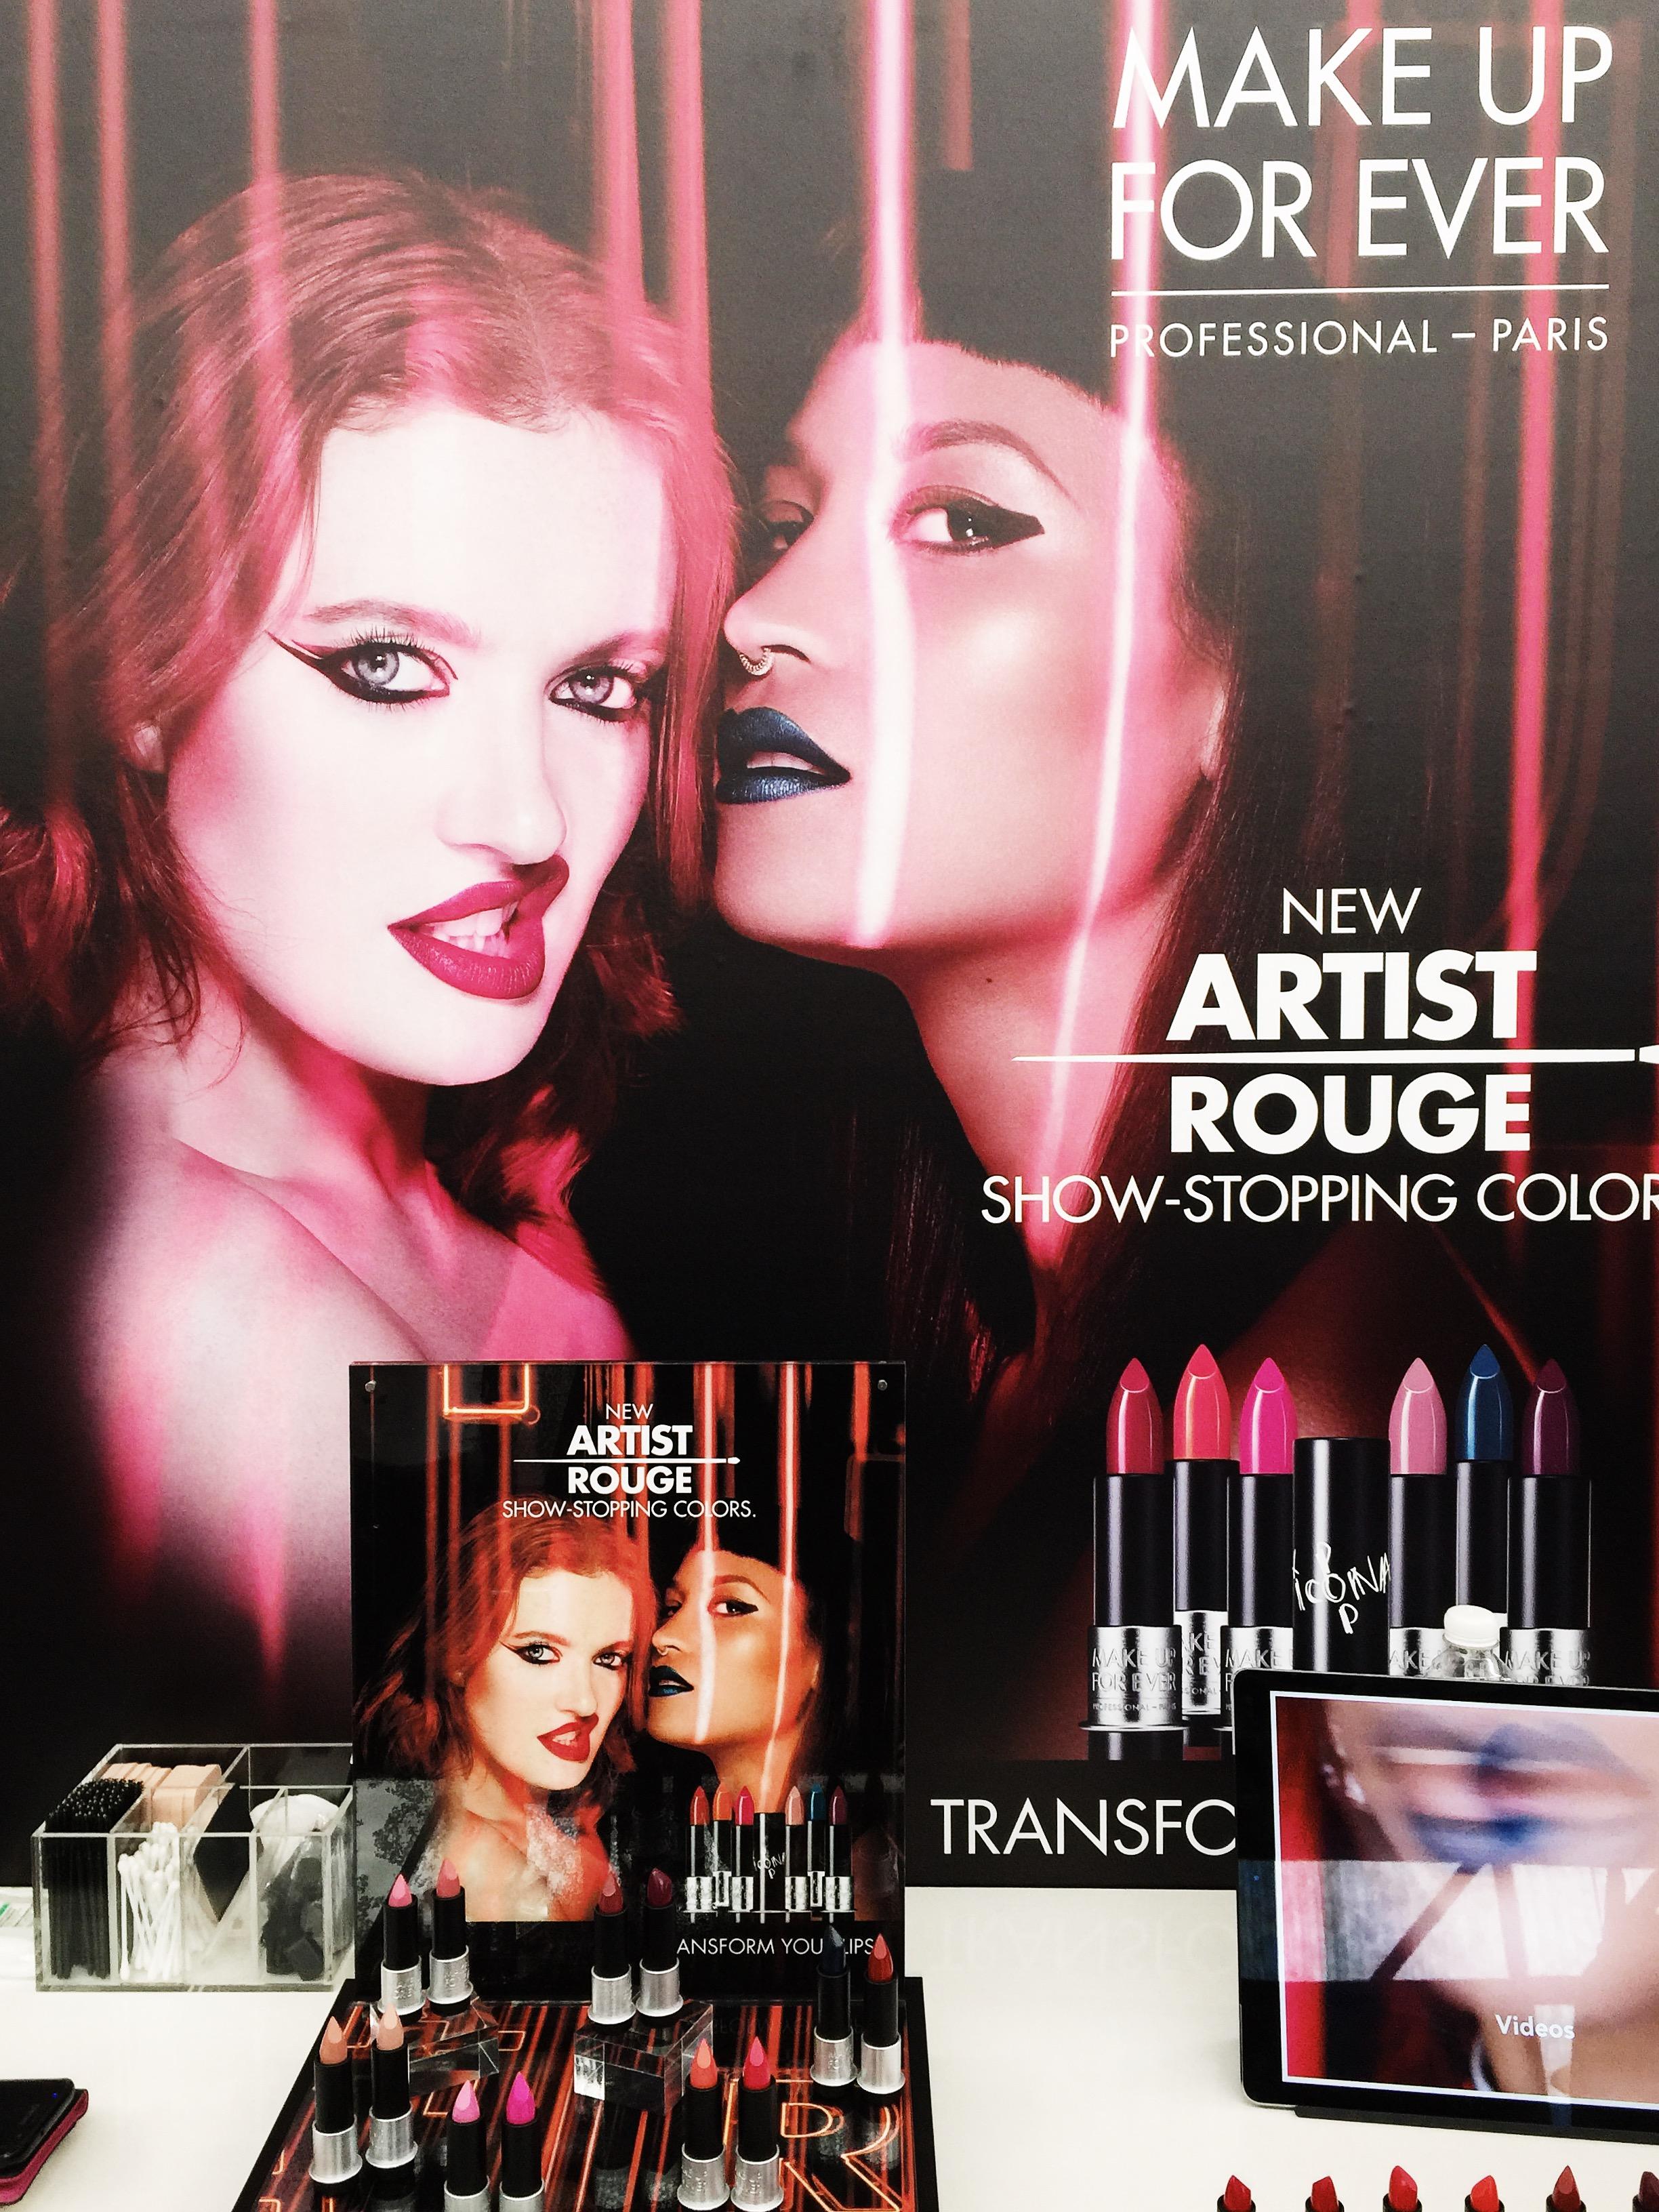 Marisa Robinson Makeup Artist Sephora Showcase Make Up For Ever